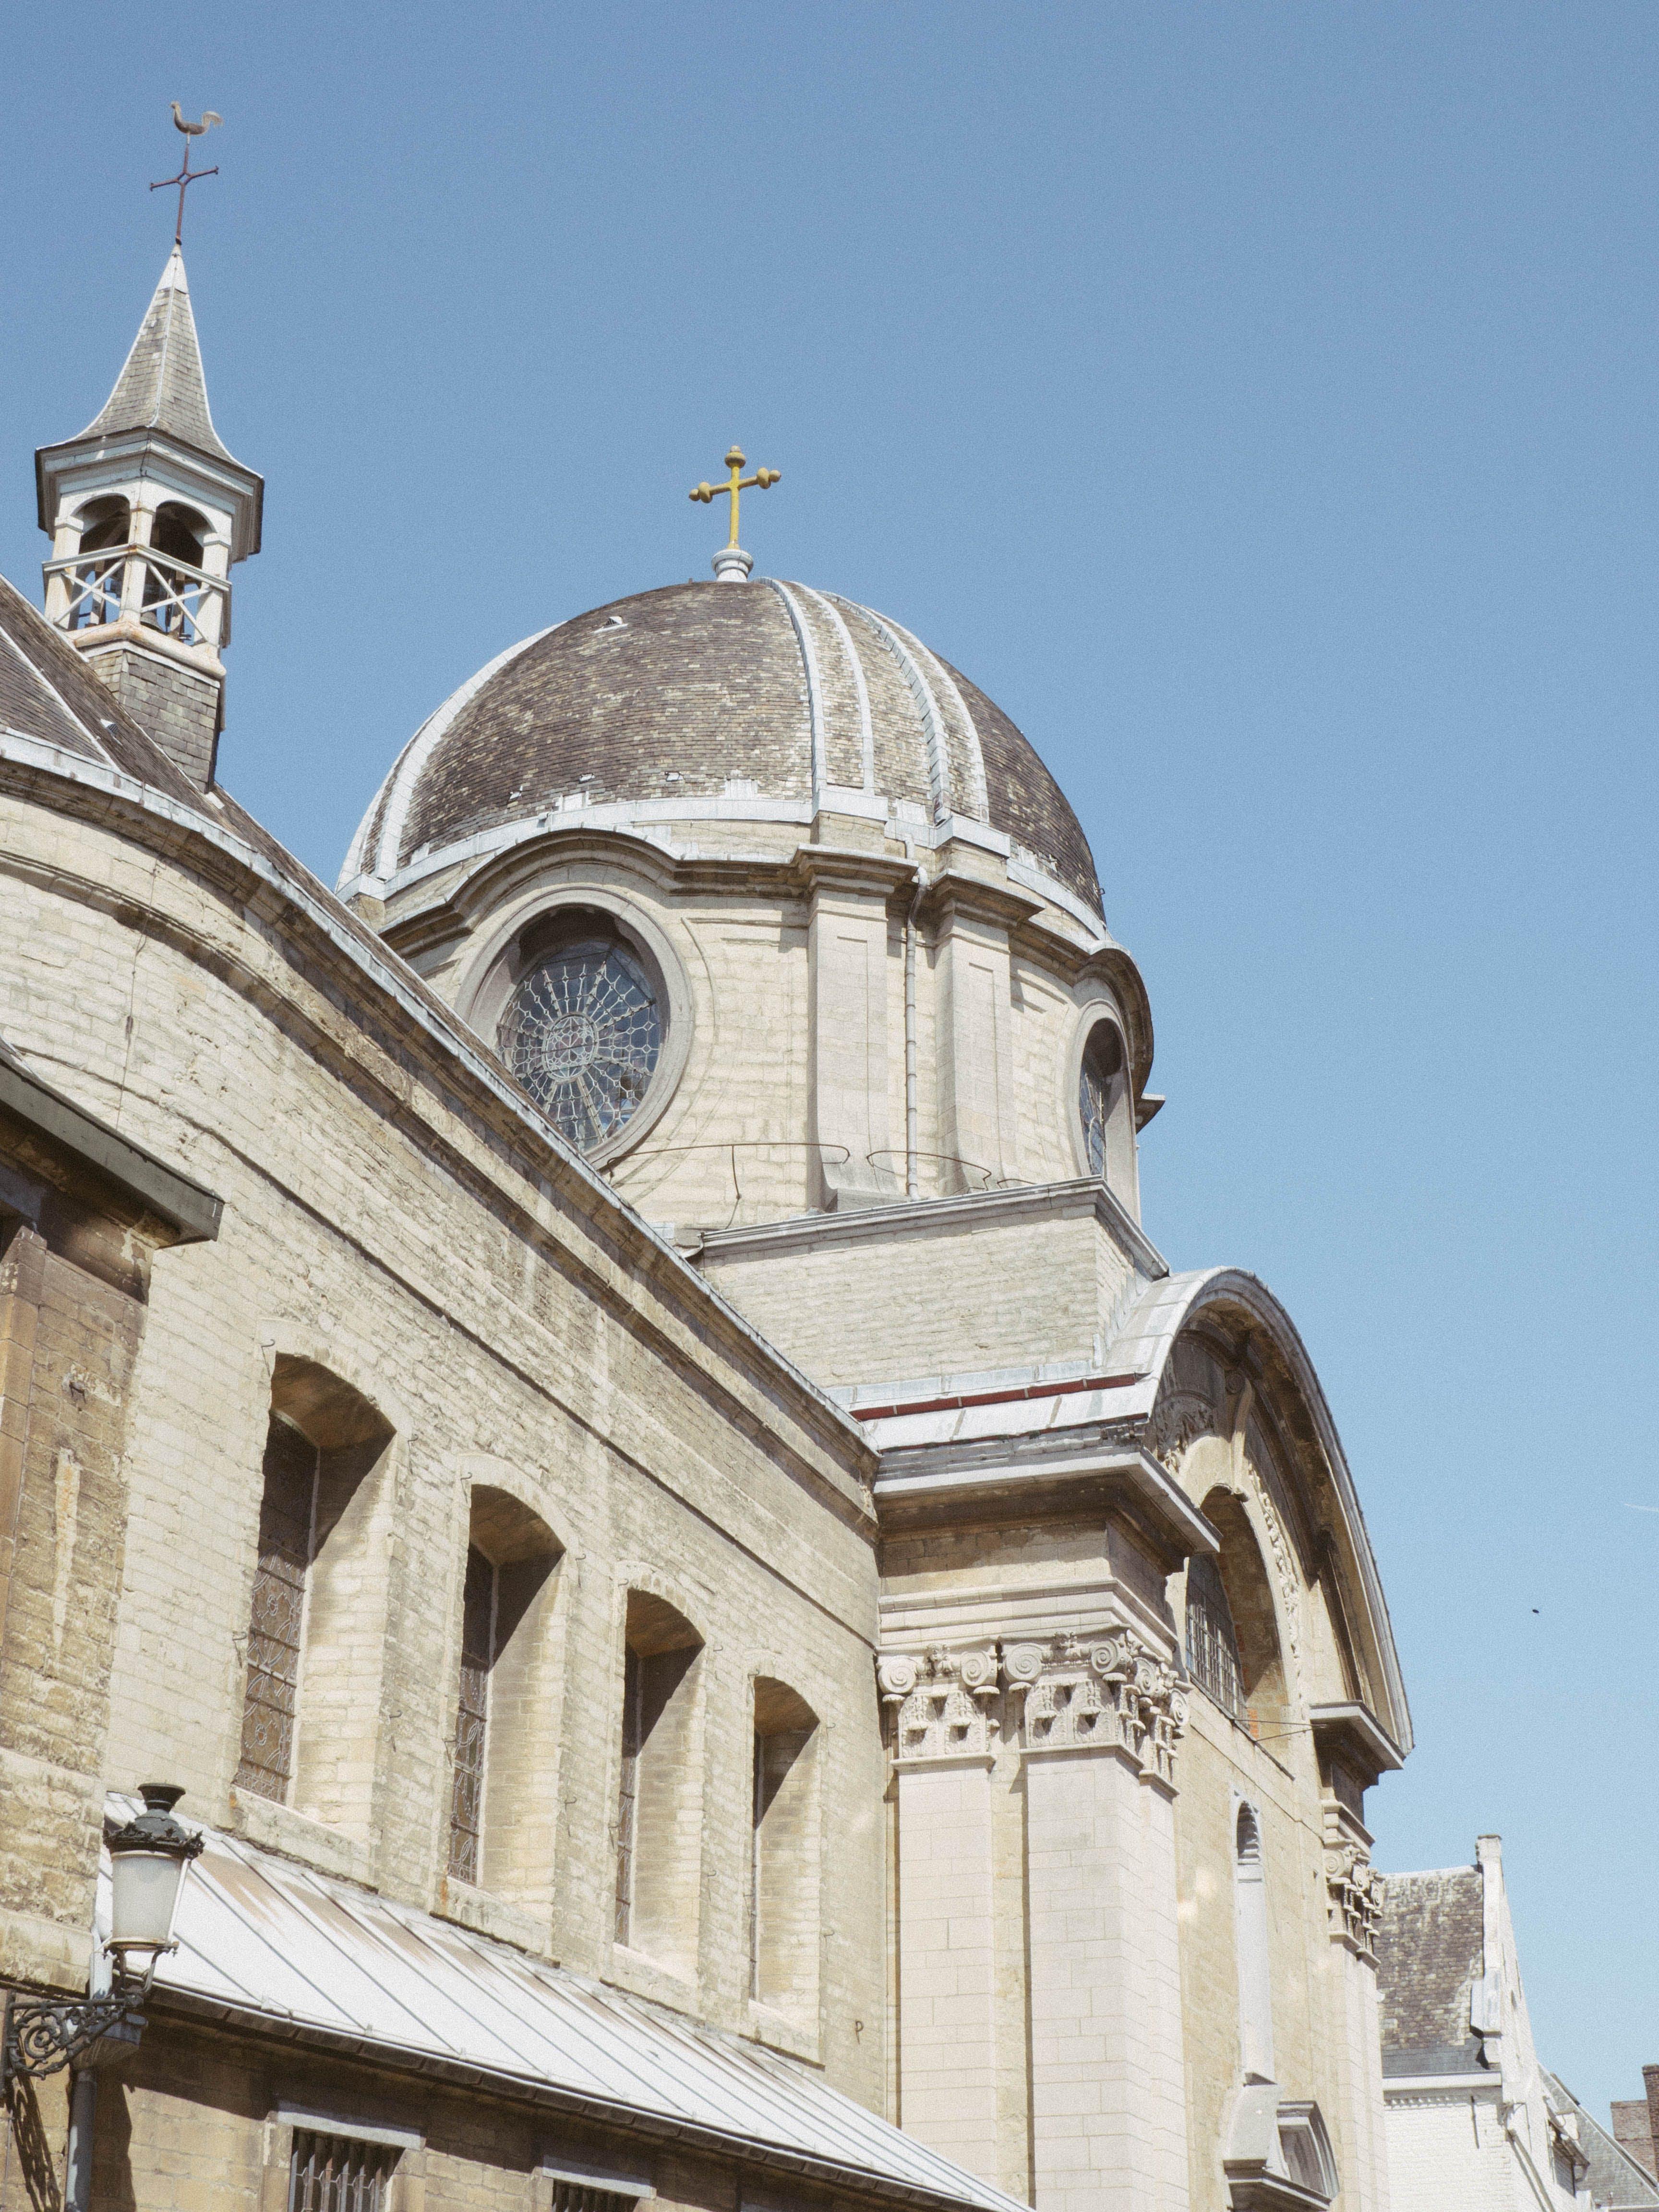 Old Church Under Blue Sky